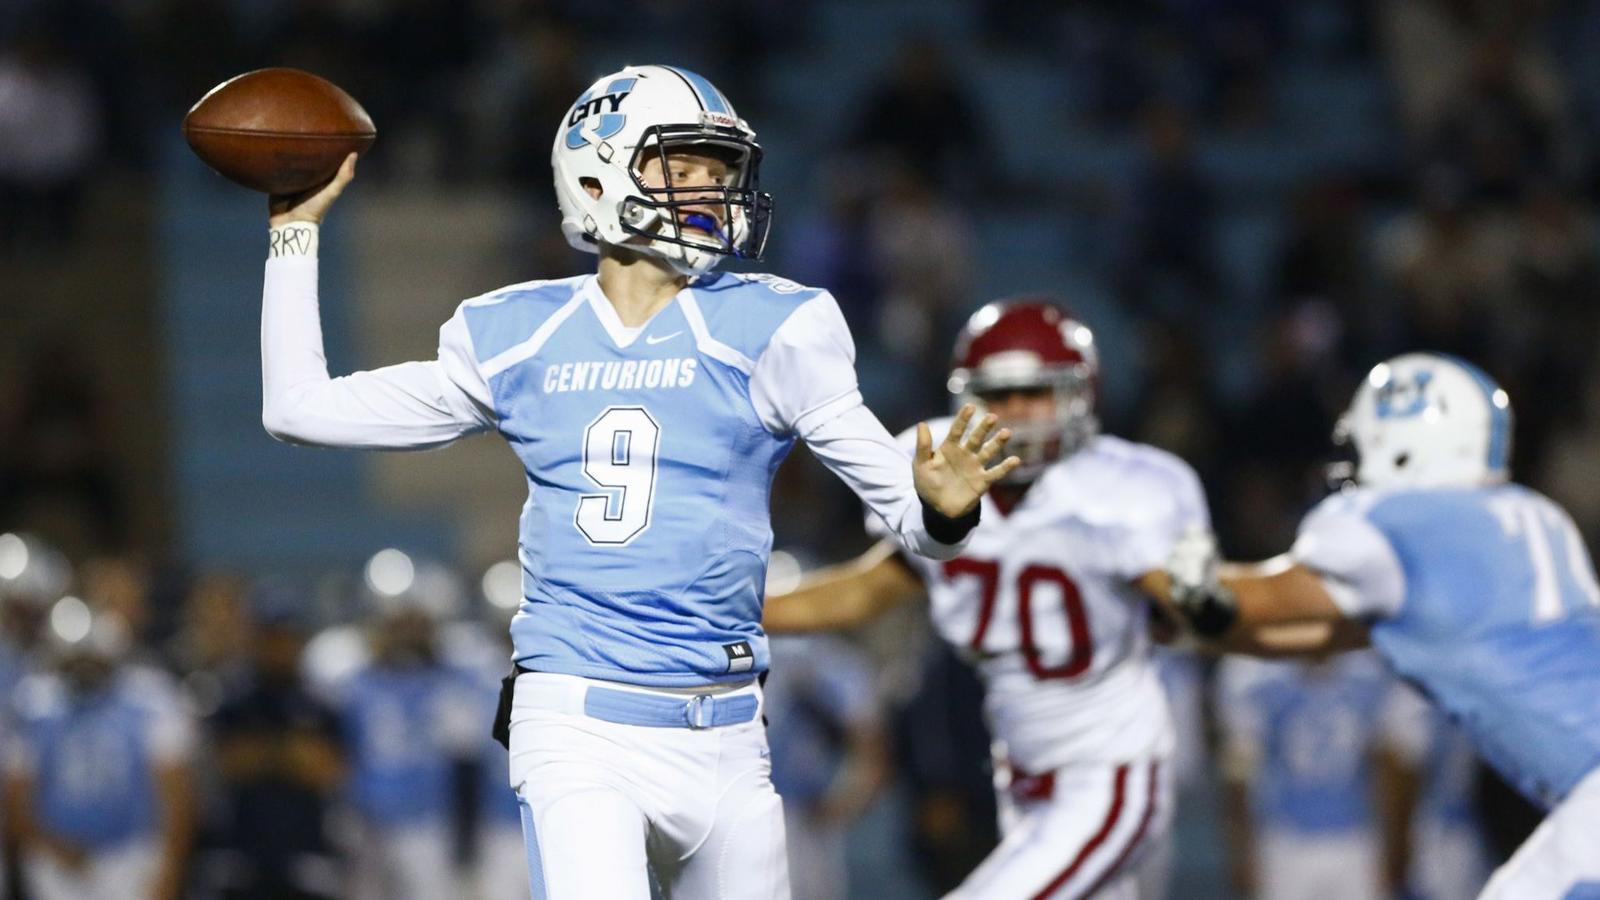 University City quarterback Gunnar Gray threw for 2,748 yards and 31 TDs as a sophomore last season. (Chadd Cady)  Union-Tribune